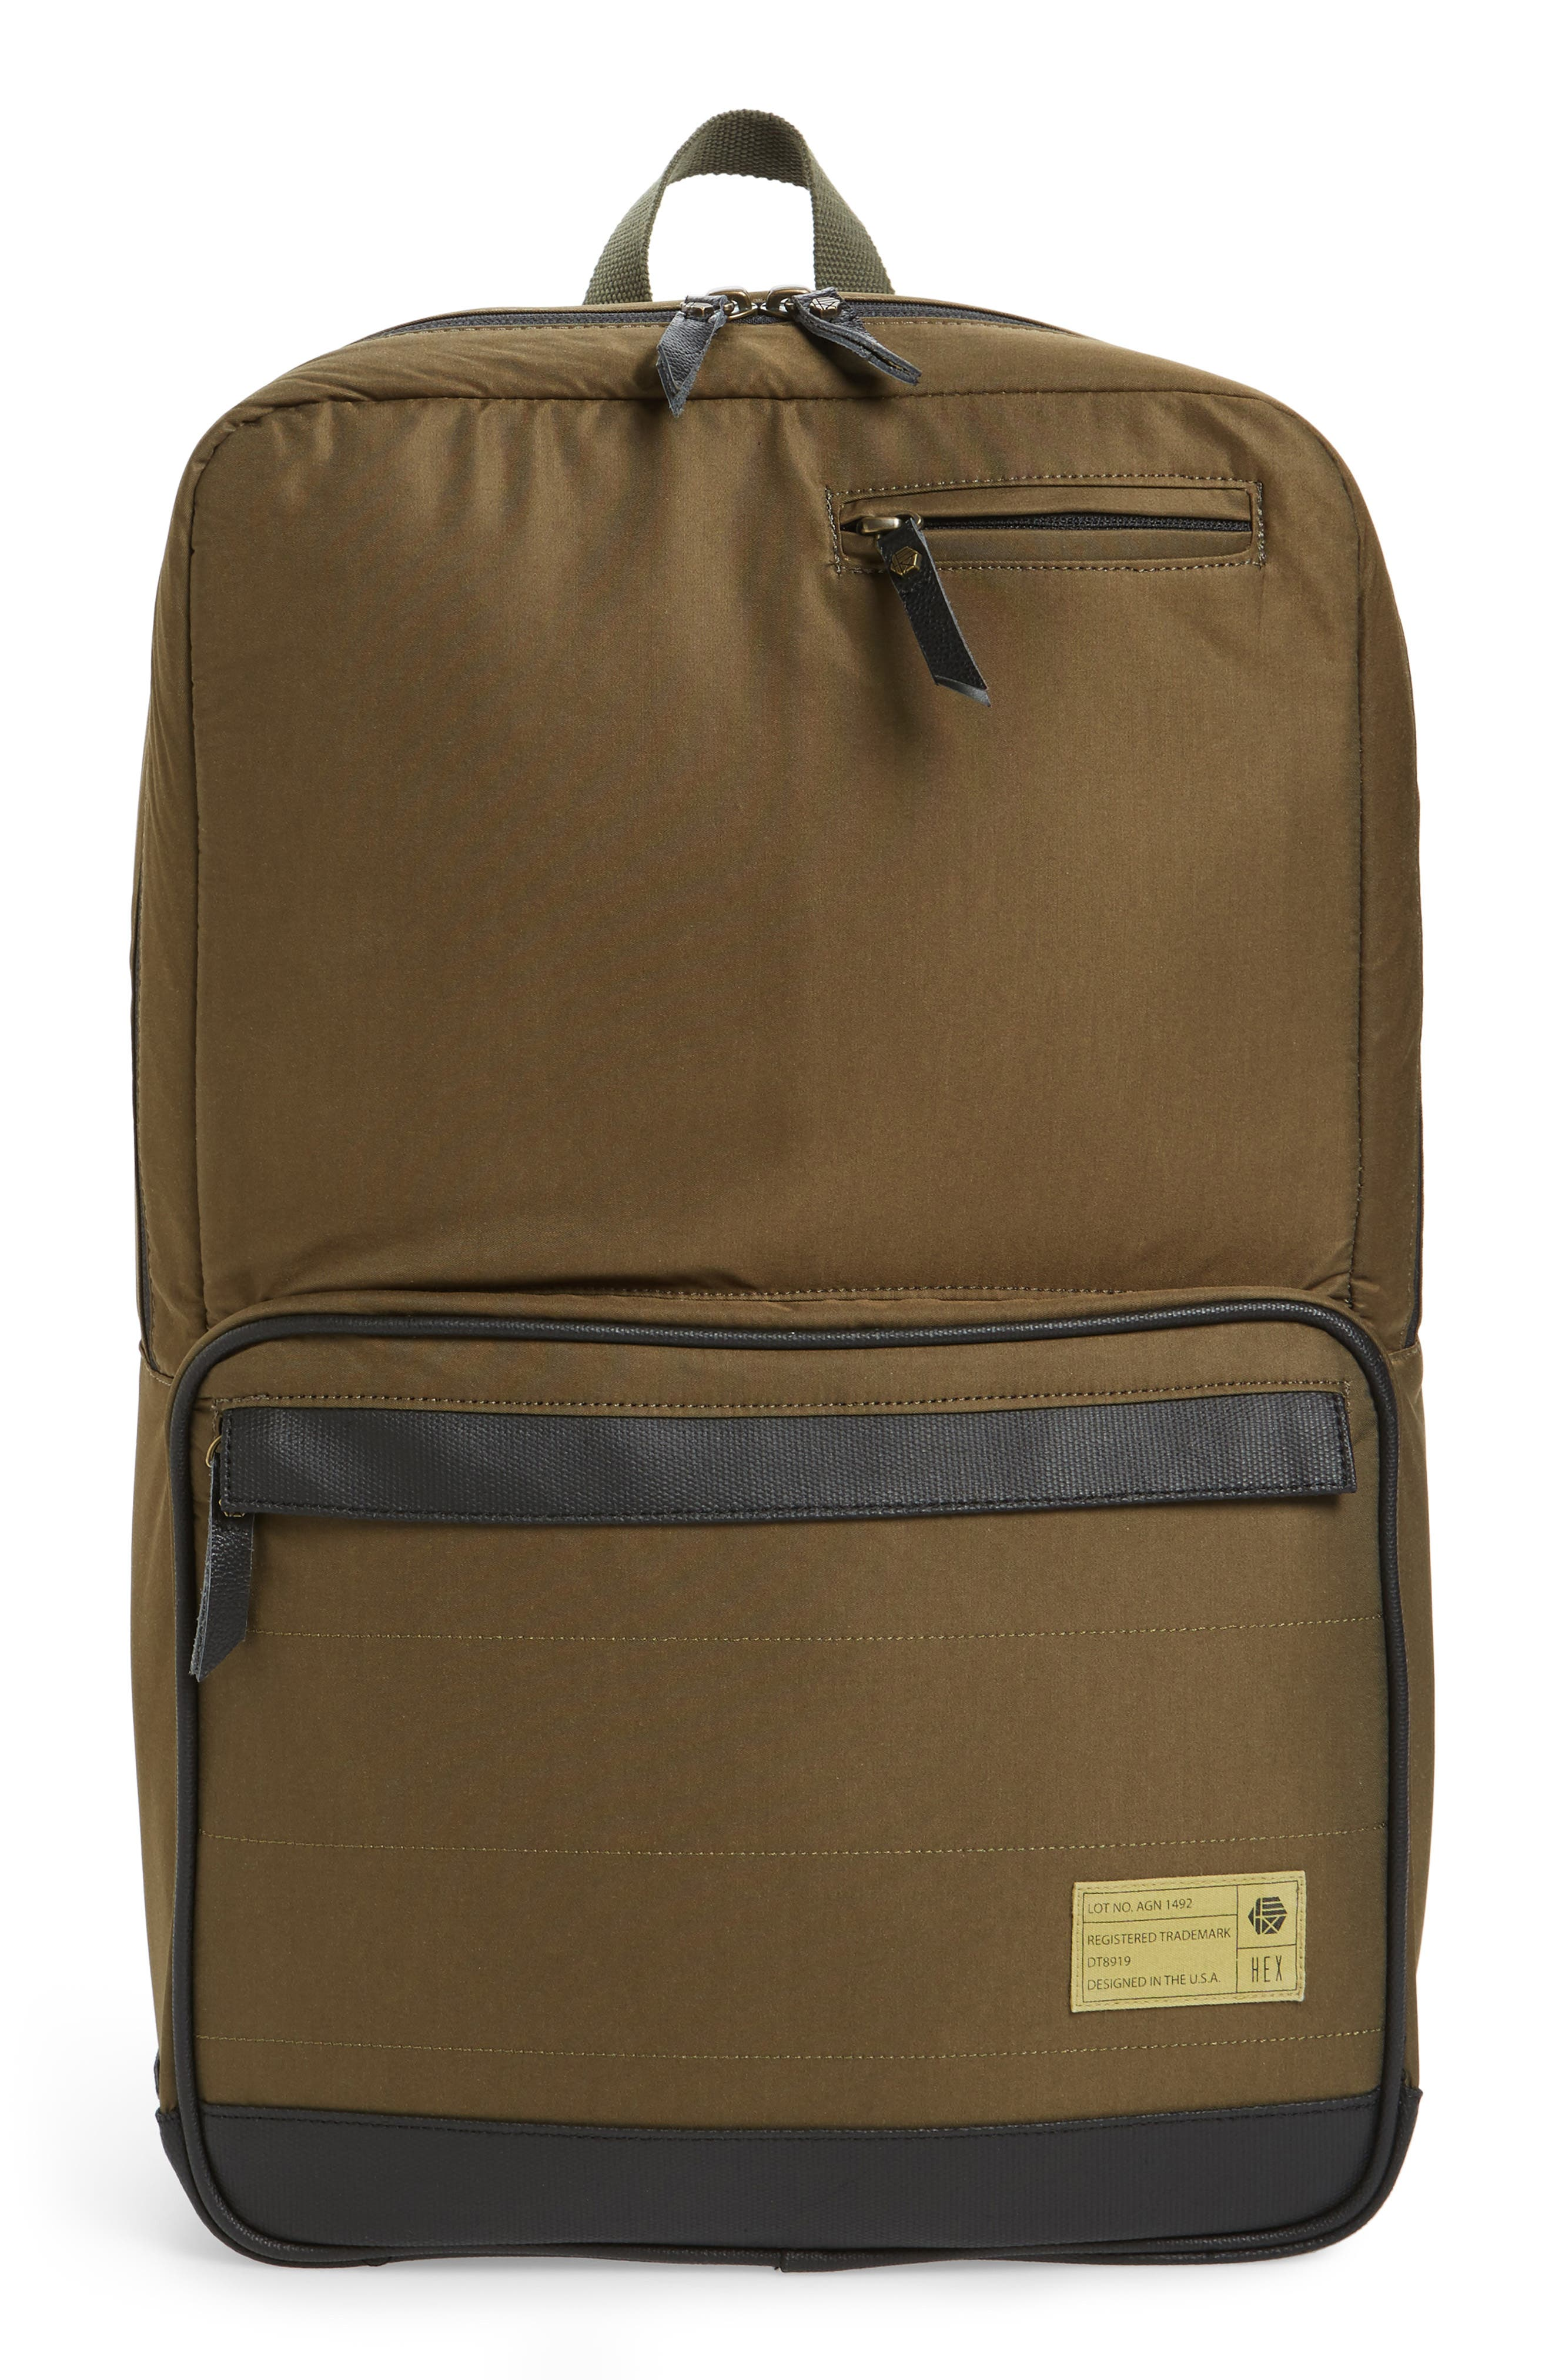 Main Image - HEX Radar Origin Water Resistant Commuter/Travel Laptop Backpack